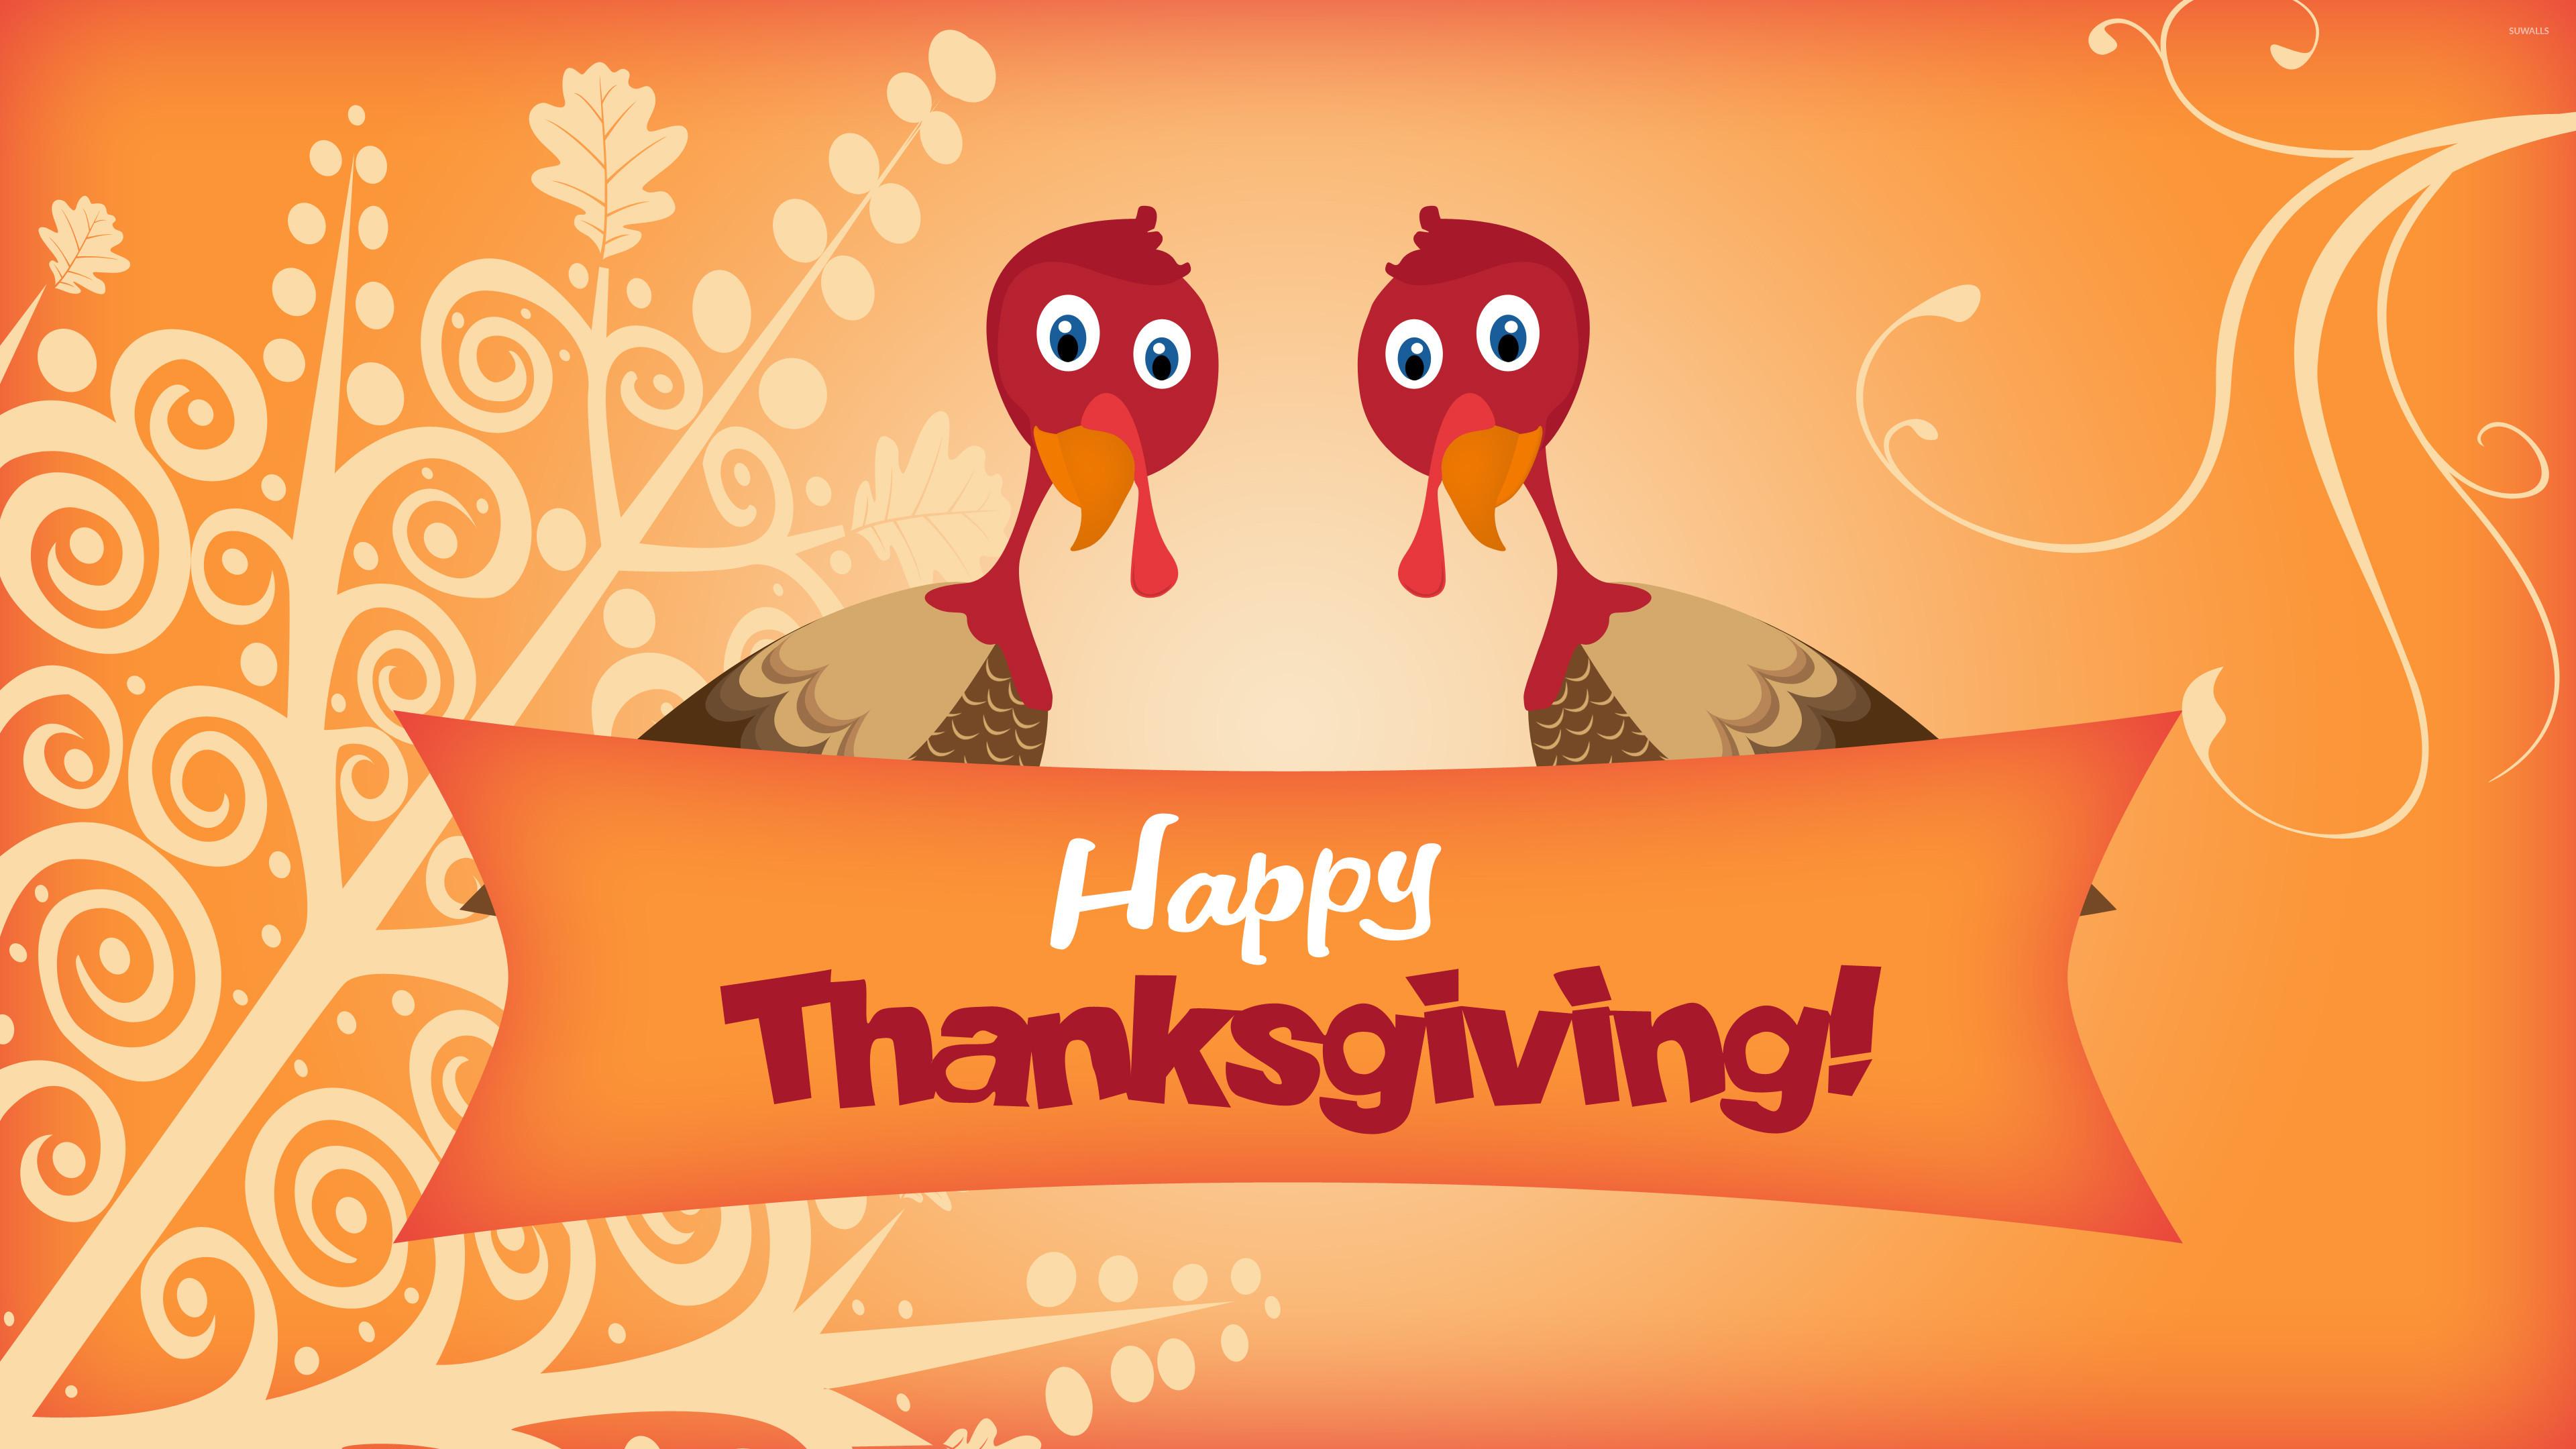 Two turkeys wishing you Happy Thanksgiving wallpaper jpg